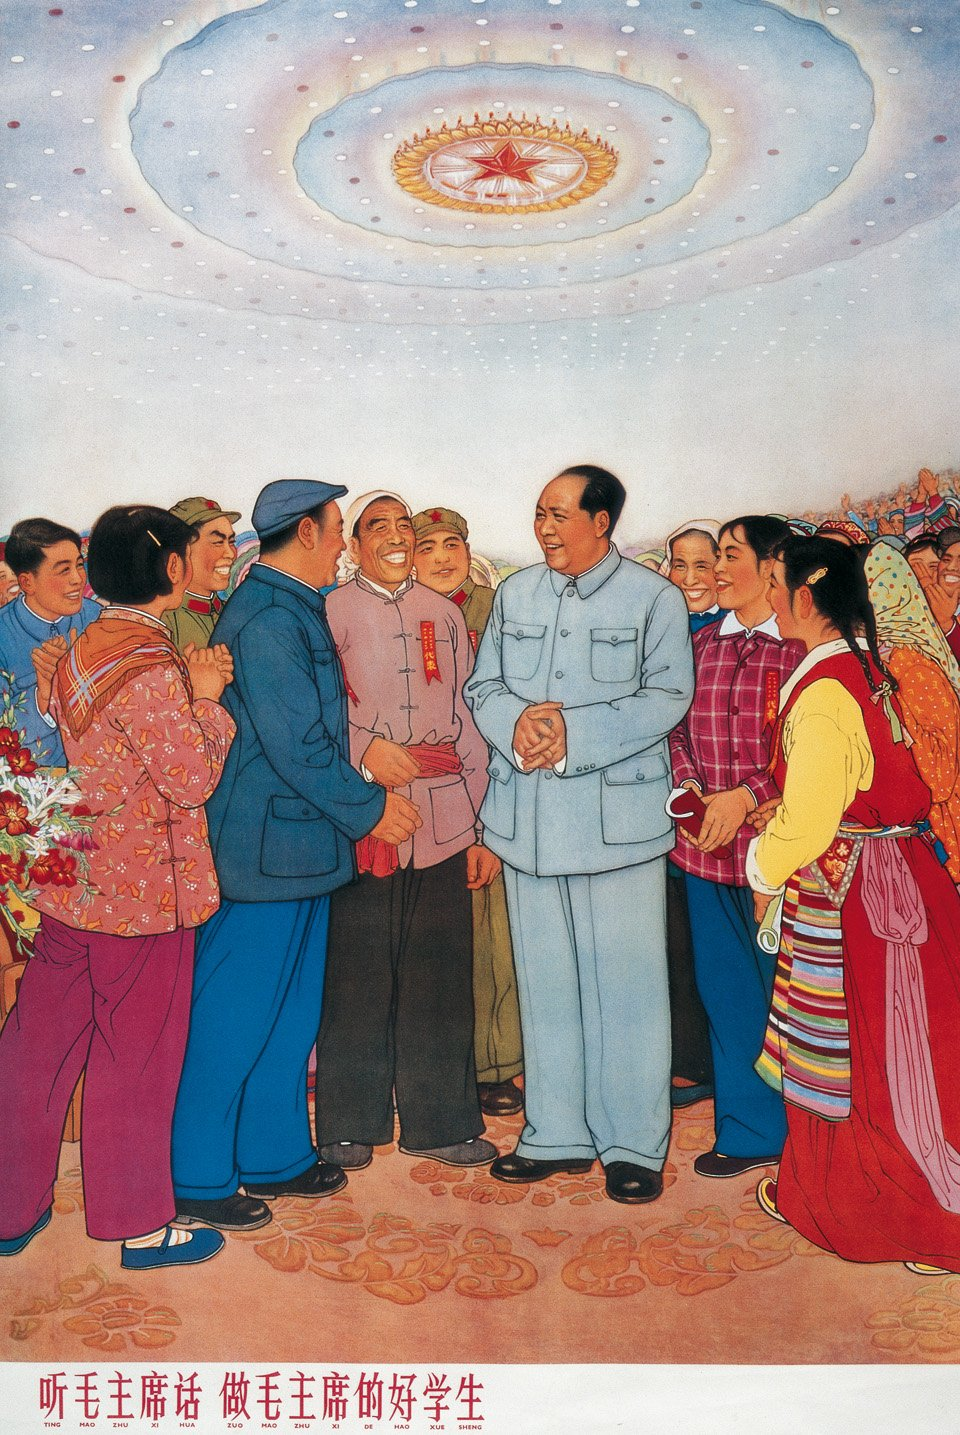 preview_va_25_chinese_propaganda_posters_05_1111101806_id_517041